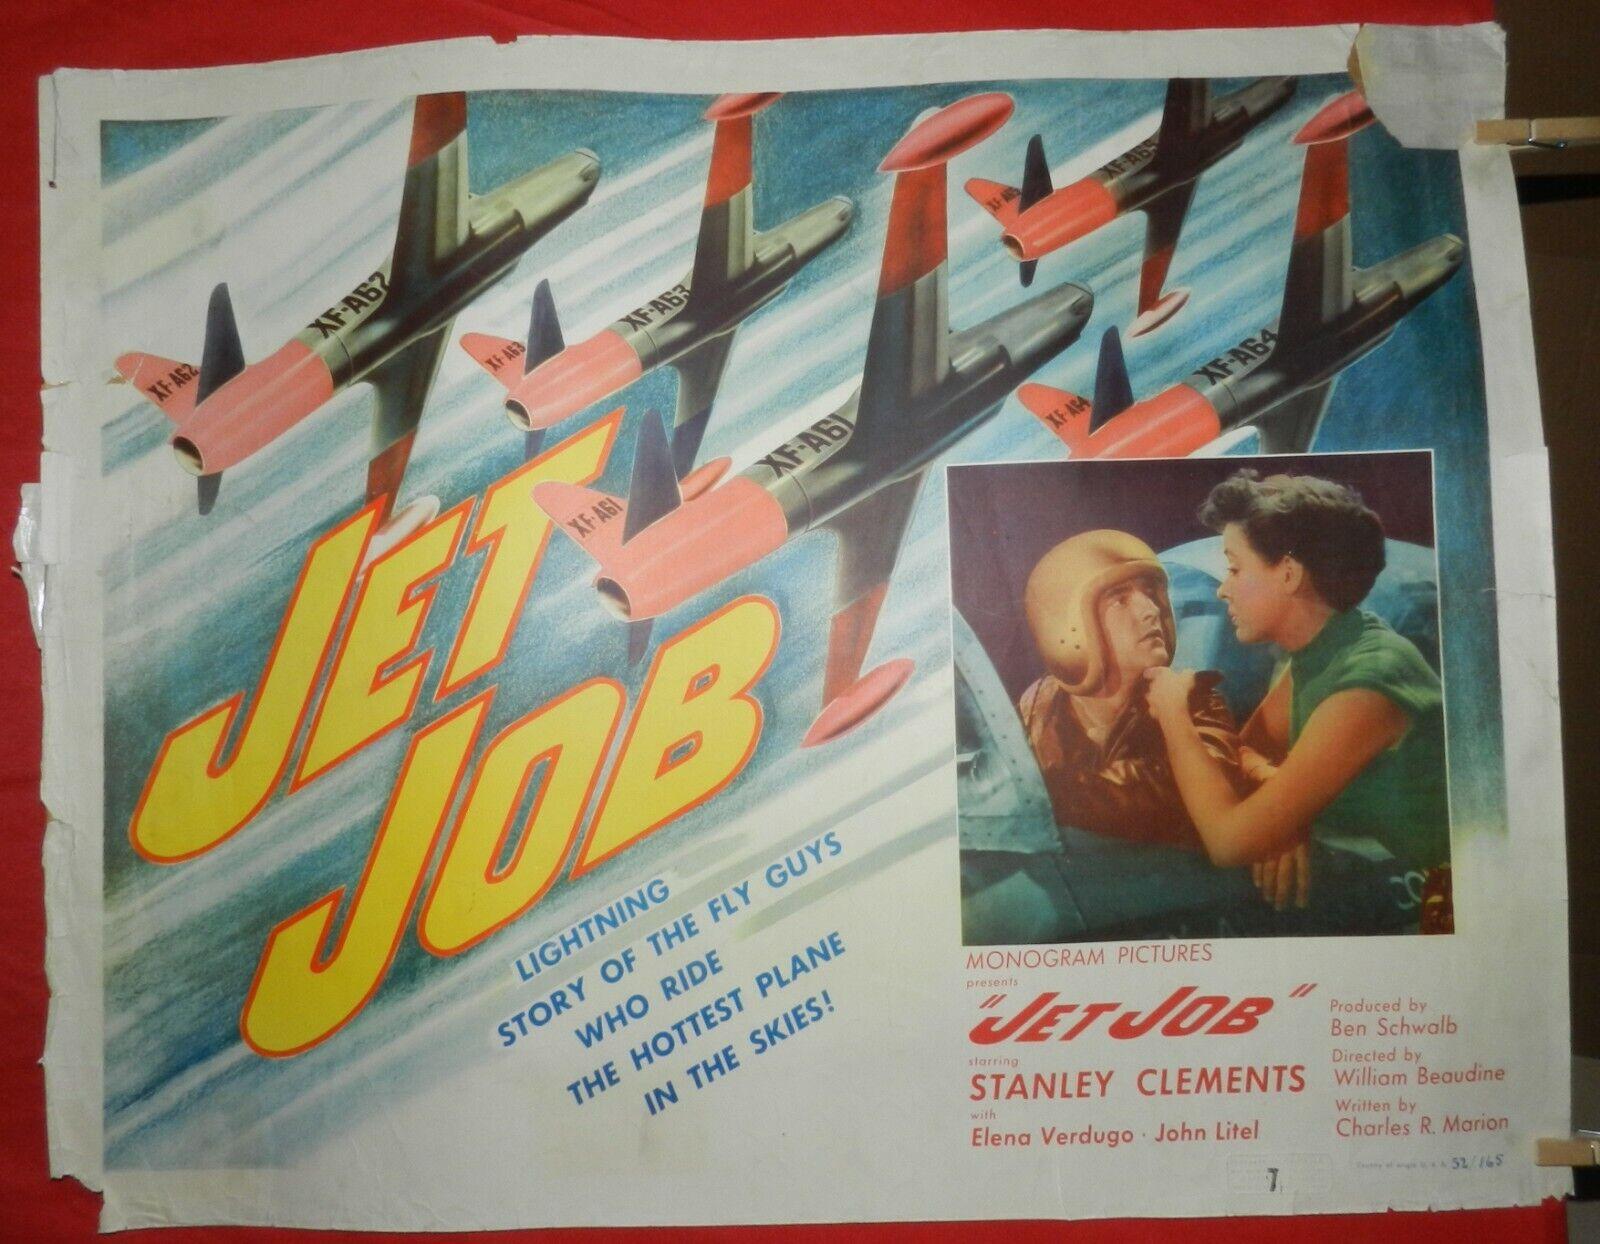 1 Vintage Half Sheet Movie Poster For Jet Job, 1952, Stanley Clements - $40.00